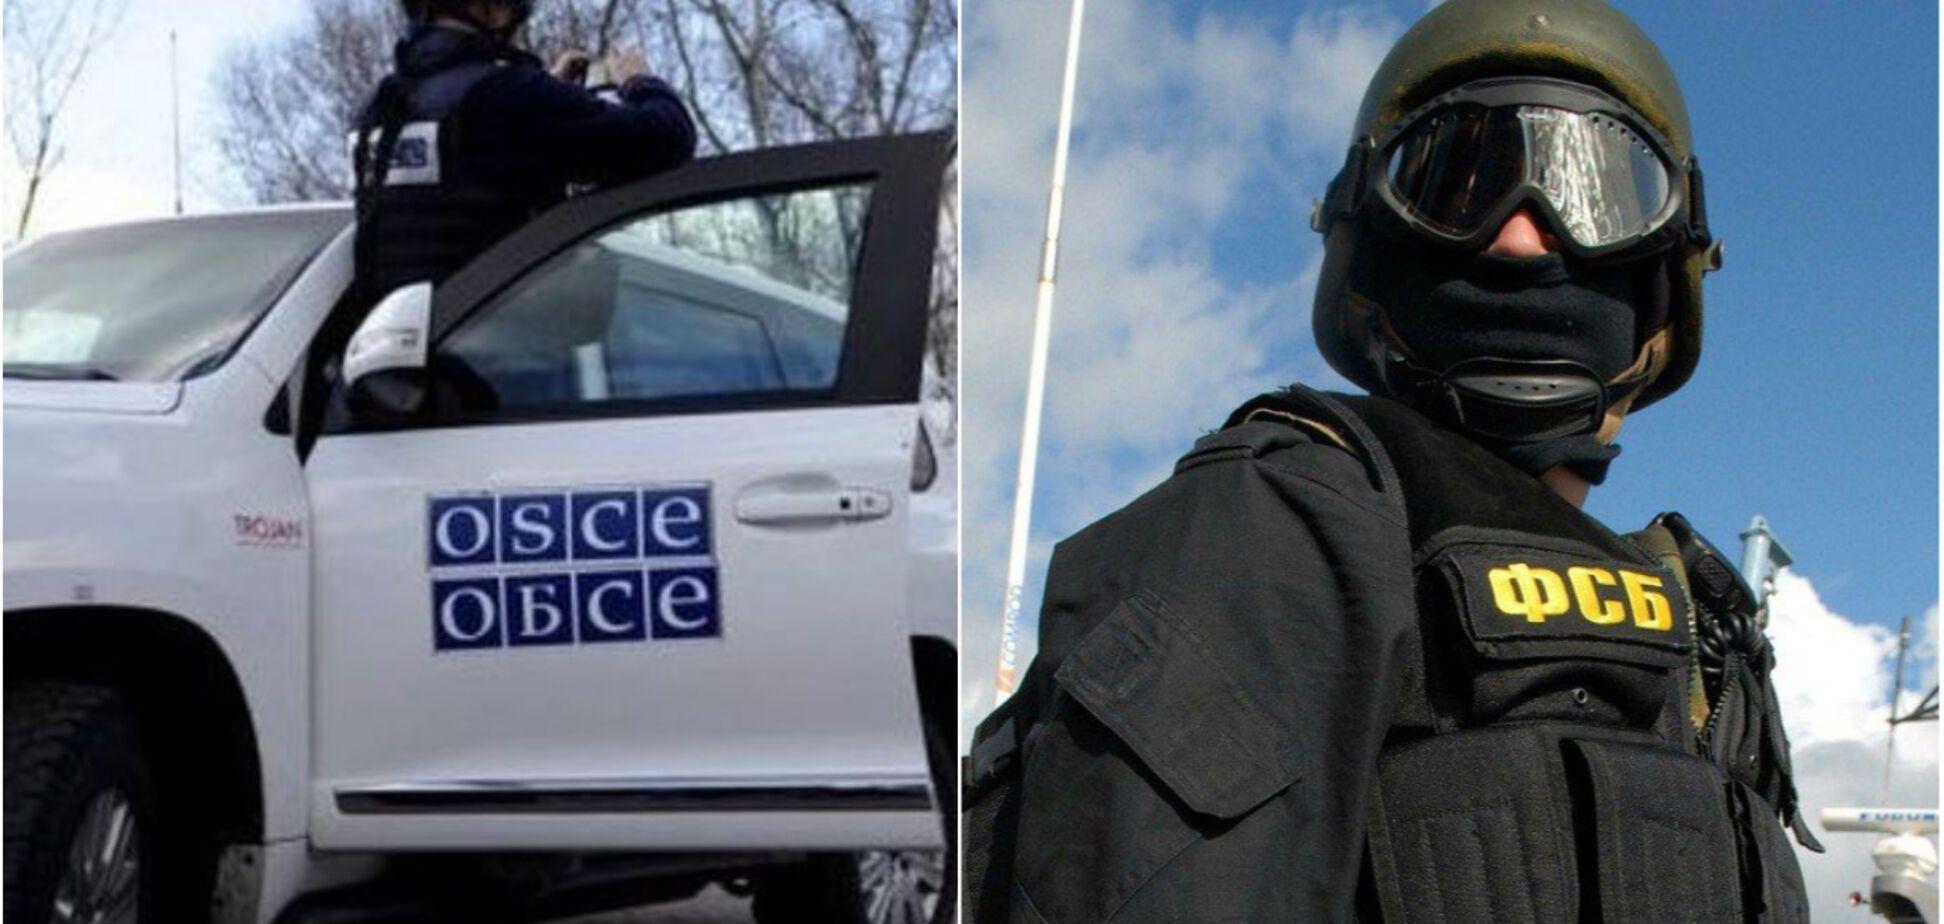 ОБСЄ ФСБ скандал